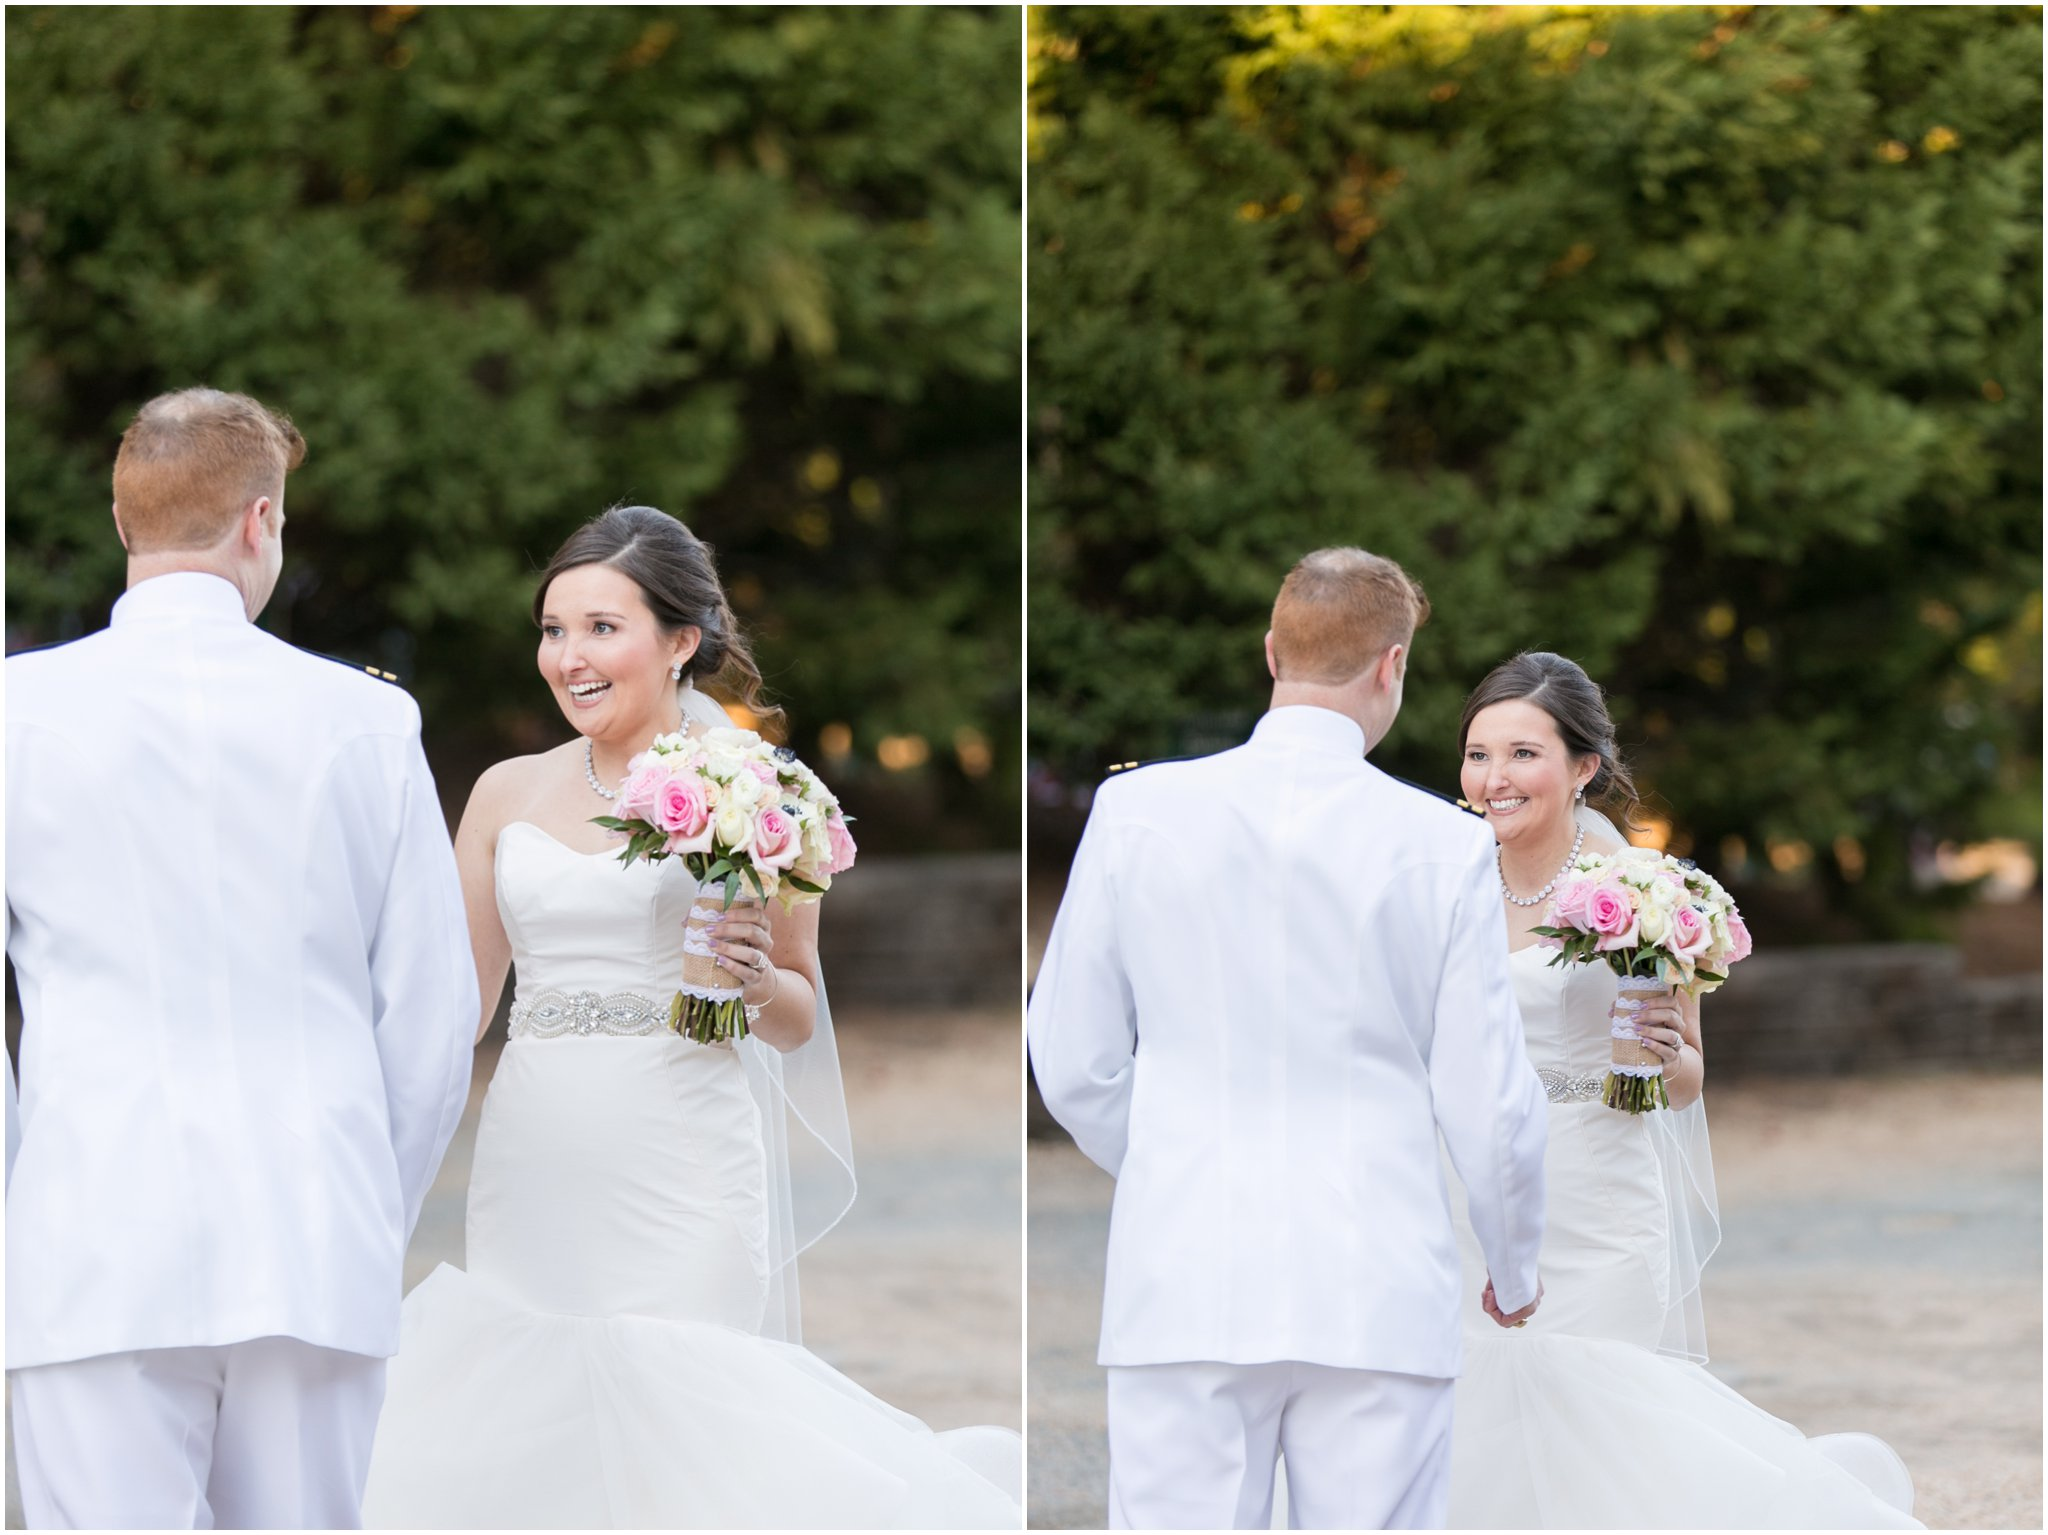 williamsburg winery wedding virginia bride and groom first look portrait